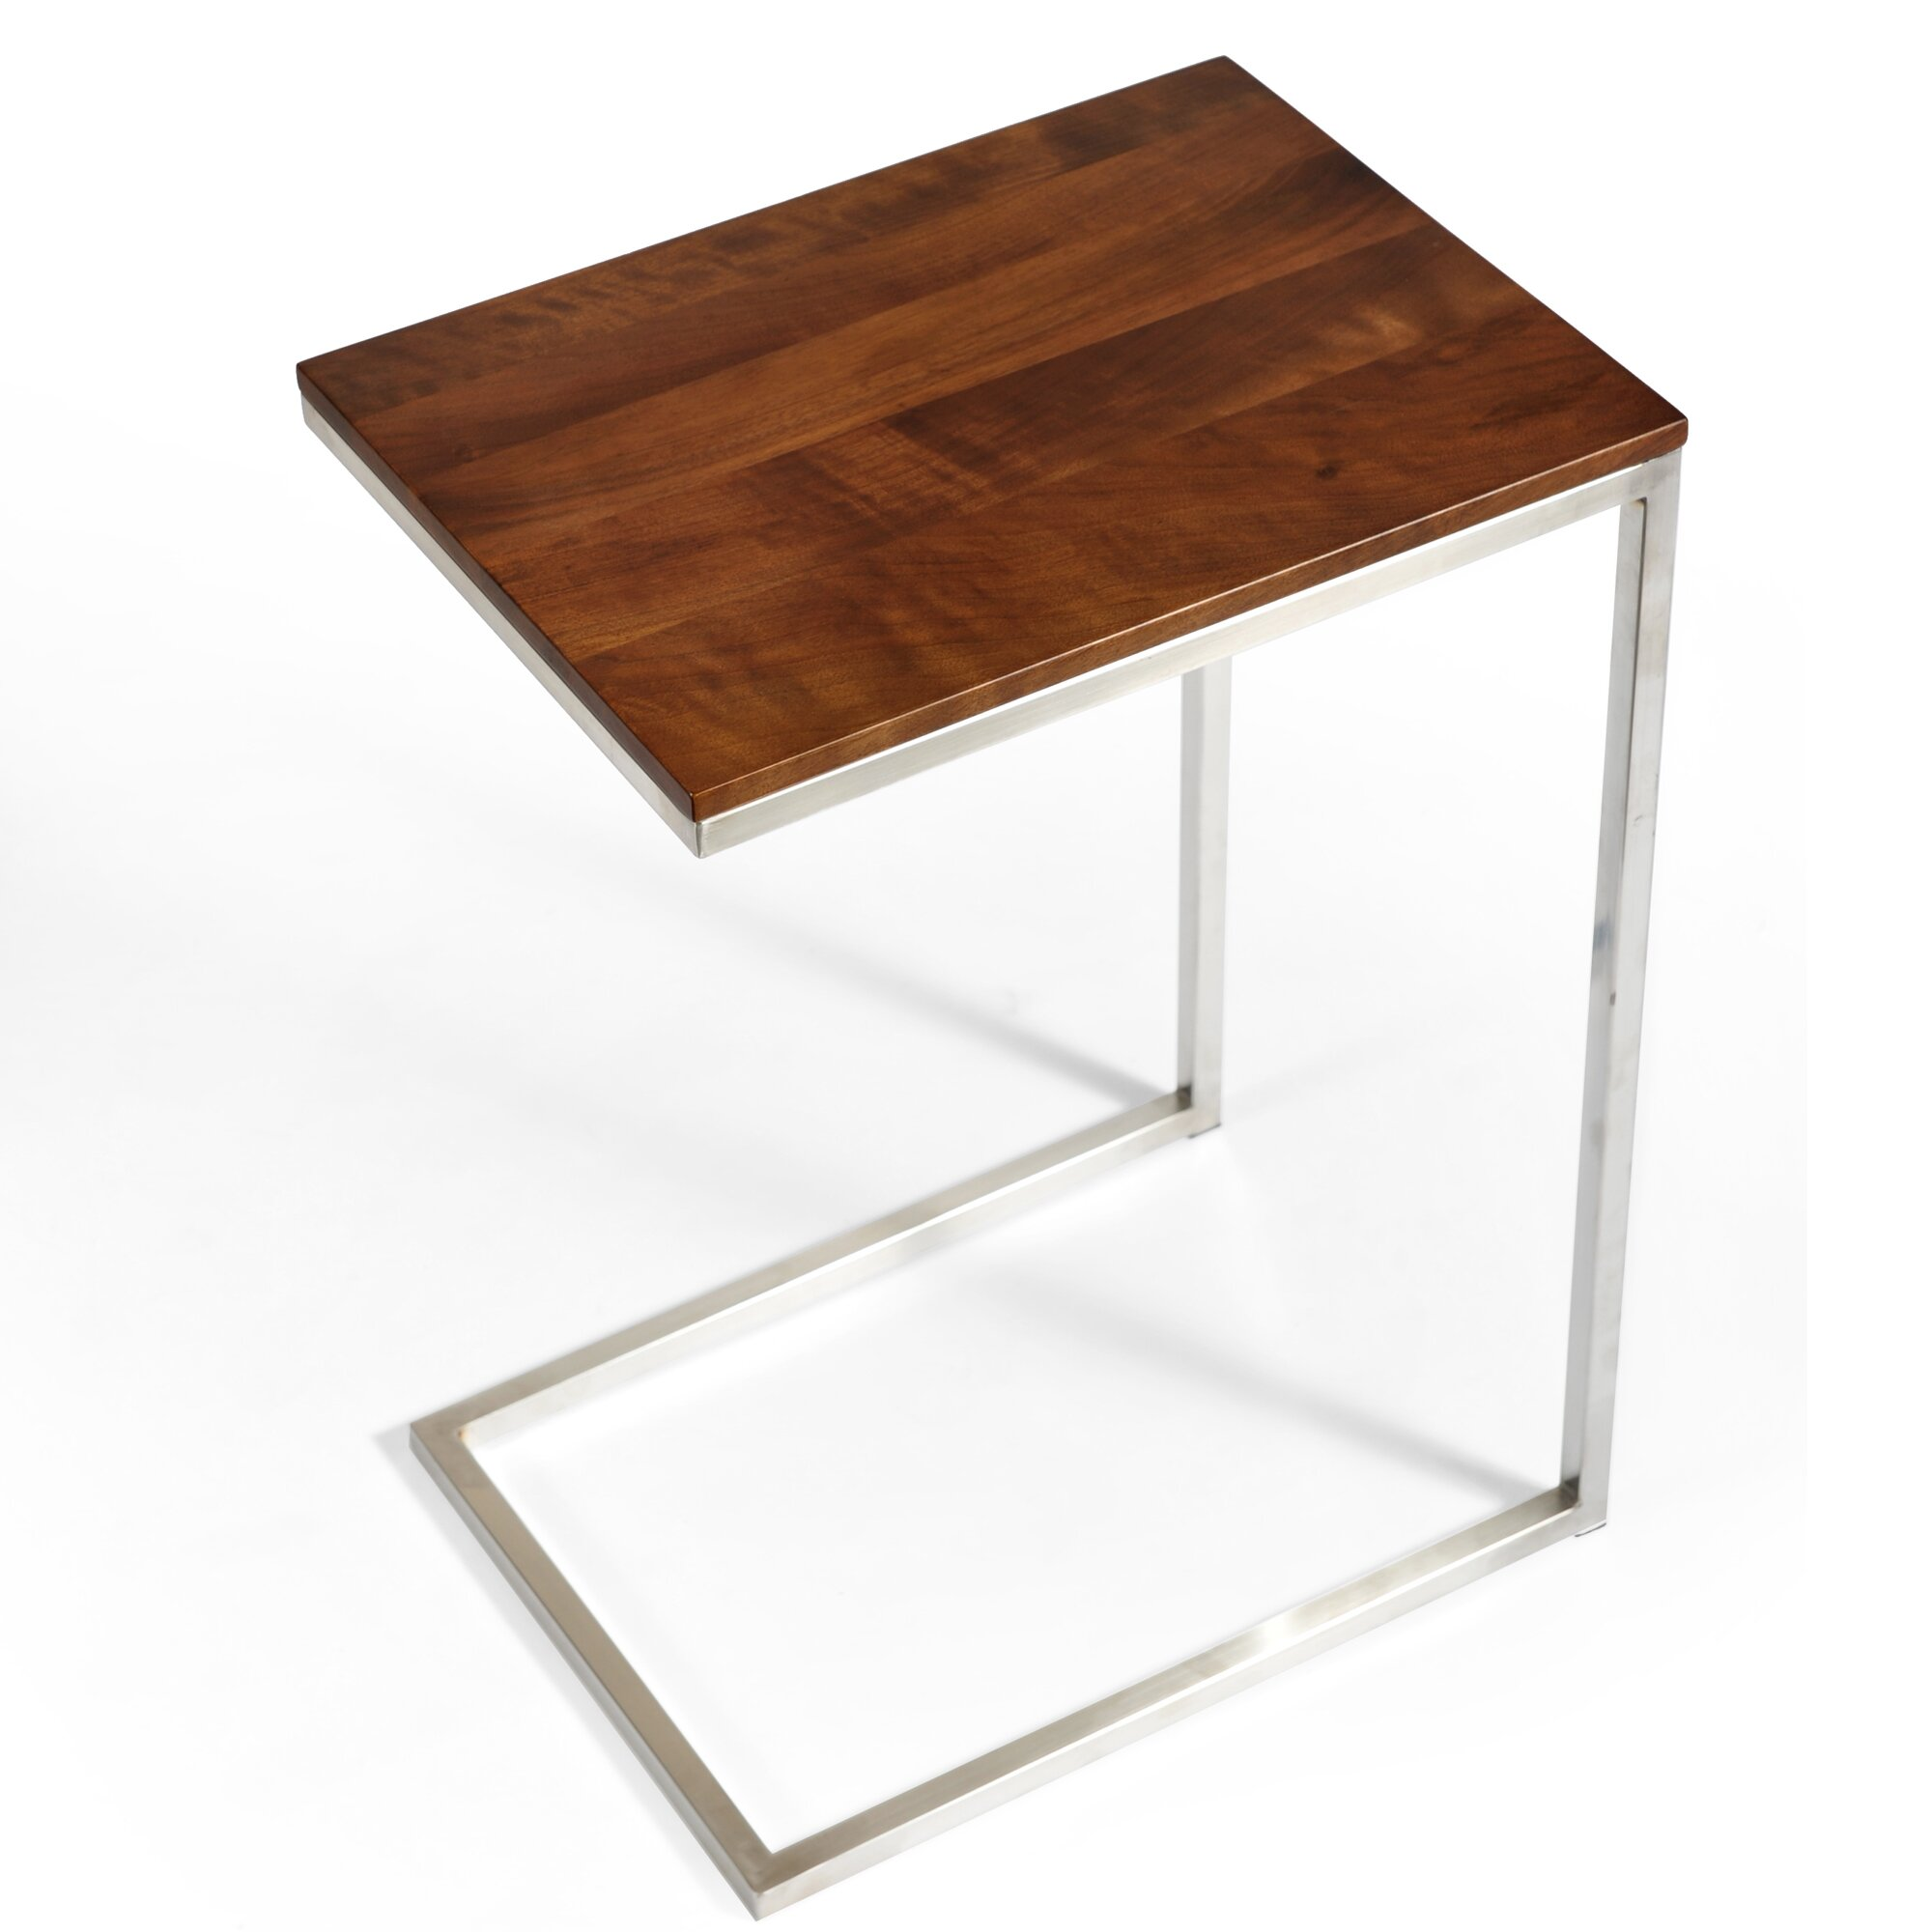 Gingko Home Furnishings Soho End Table Reviews Wayfair